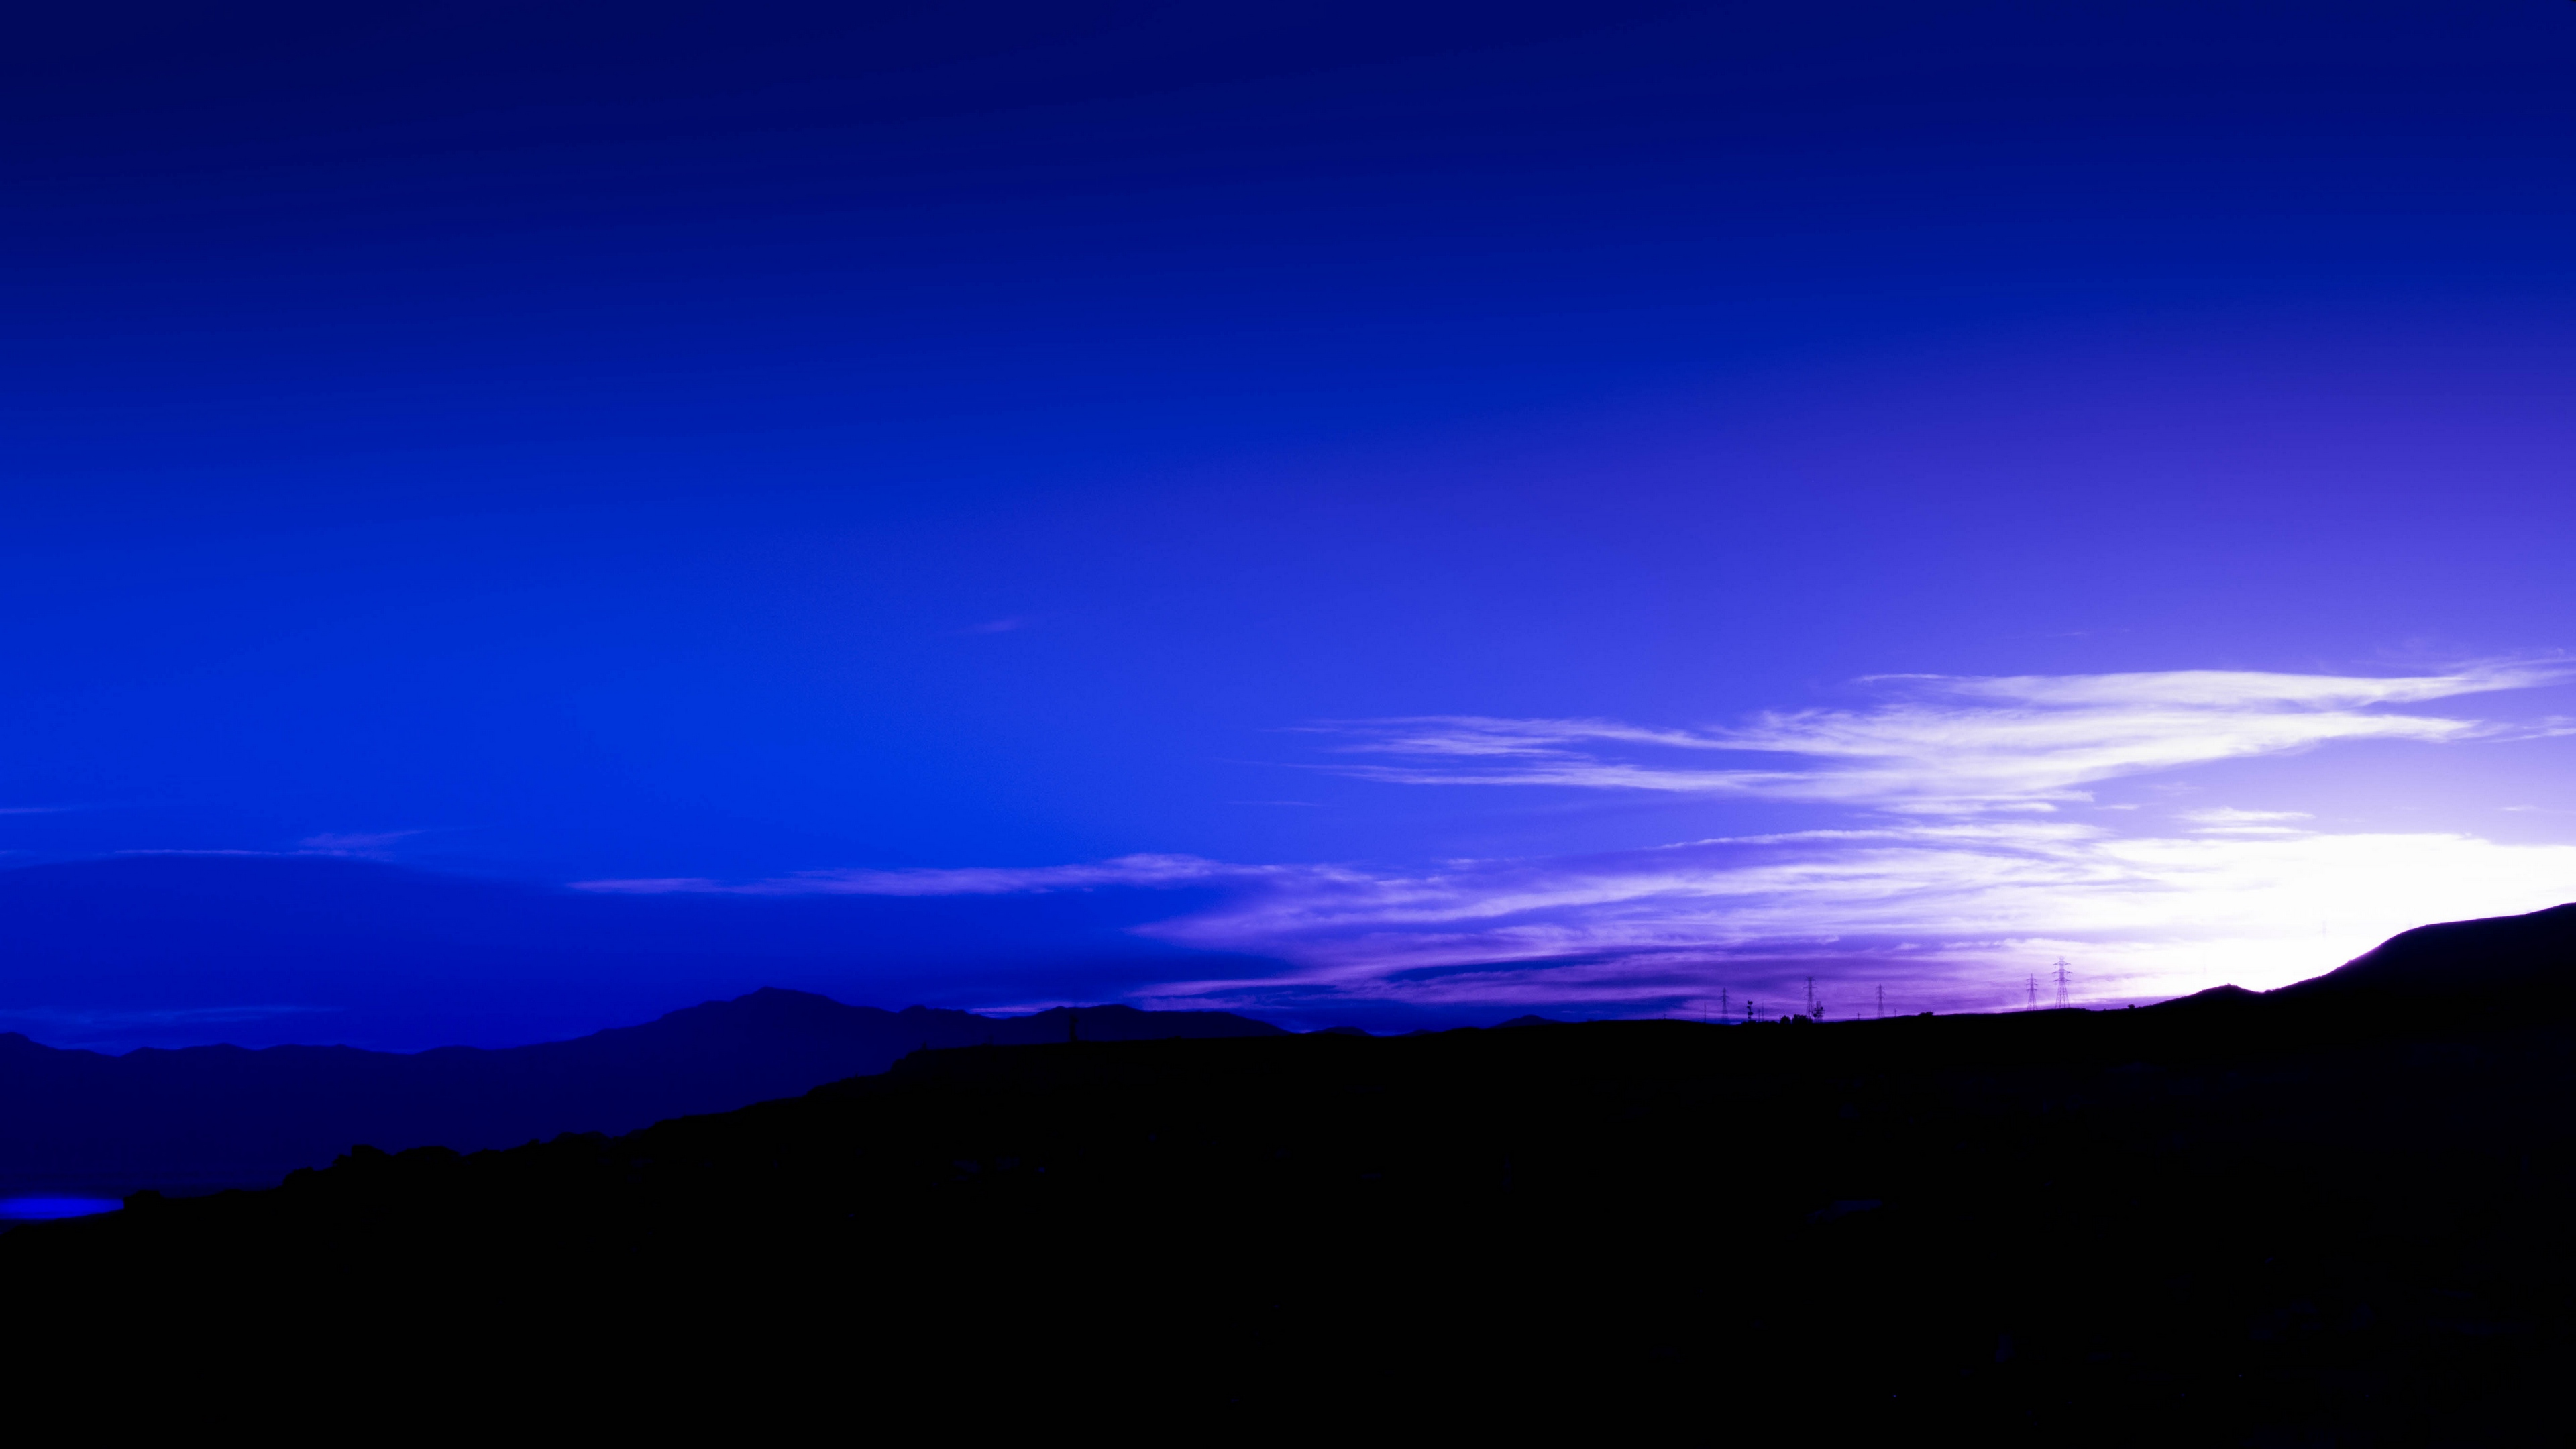 america utah landscape usa night 4k 1540574927 - america, utah, landscape, usa, night 4k - Utah, Landscape, America